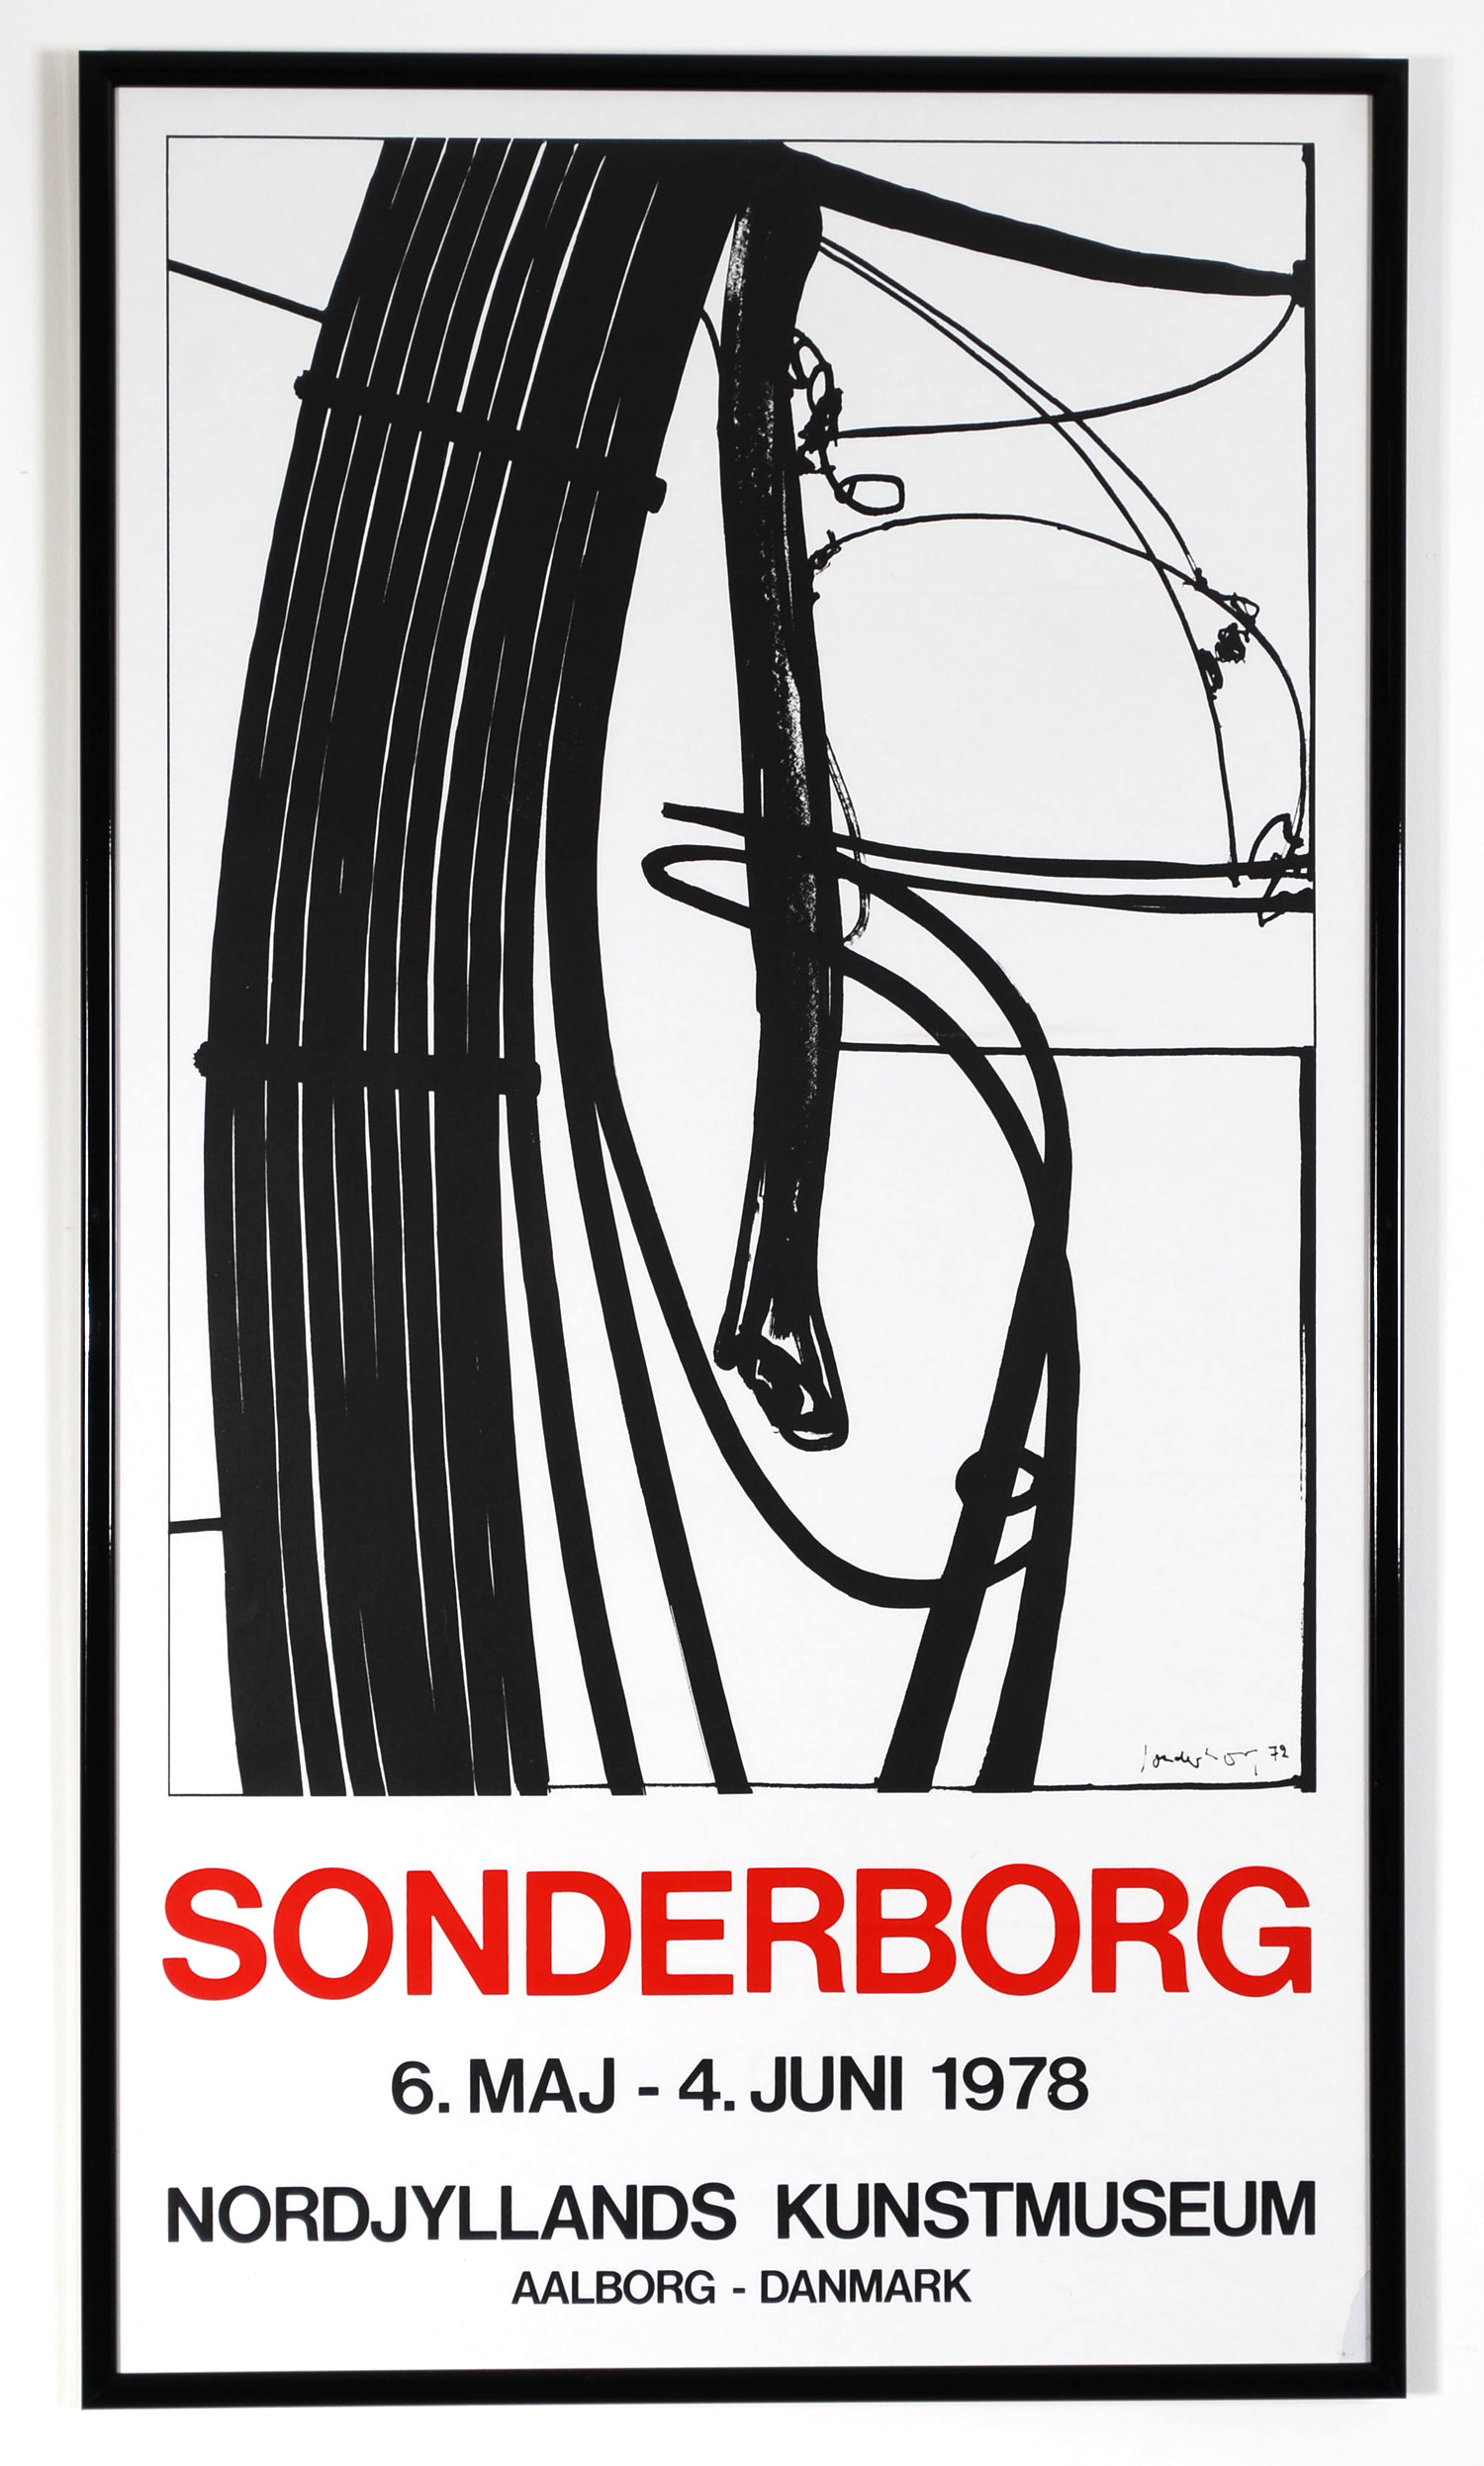 Original poster Sonderborg - Nordjyllands Kunstmuseum - Aalborg Danmark - 1978  - AVAILABLE